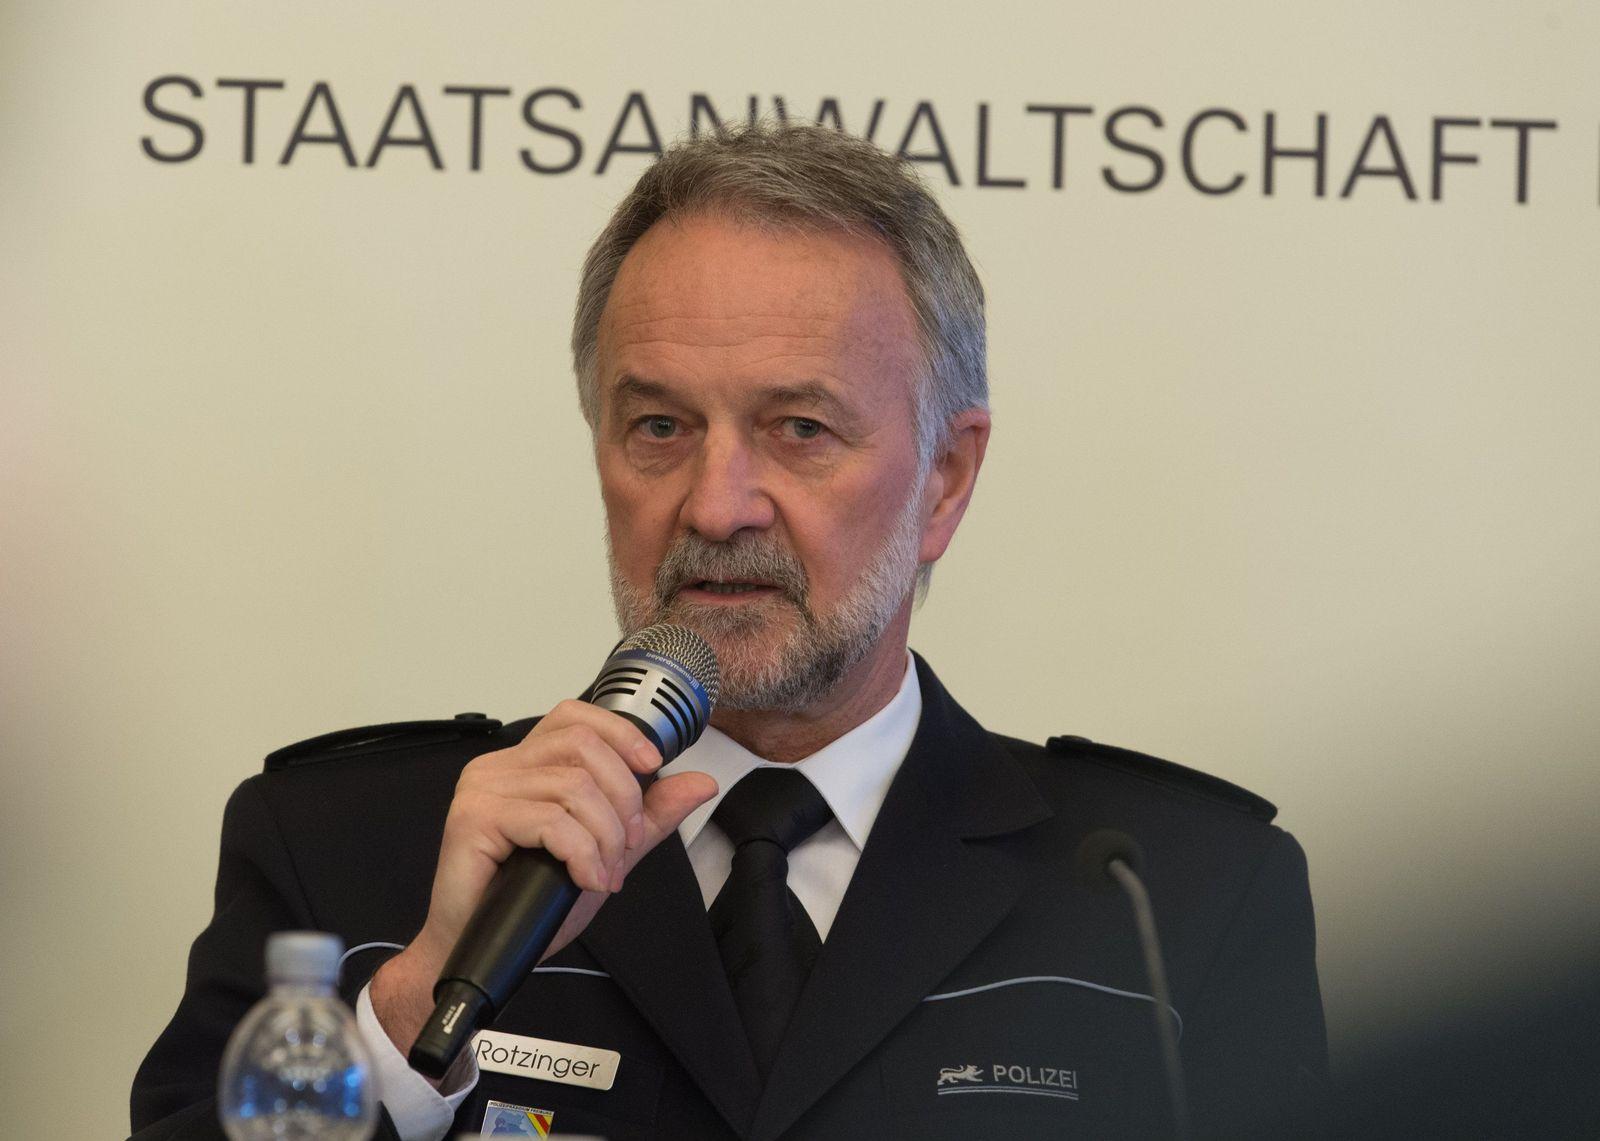 Bernhard Rotzinger